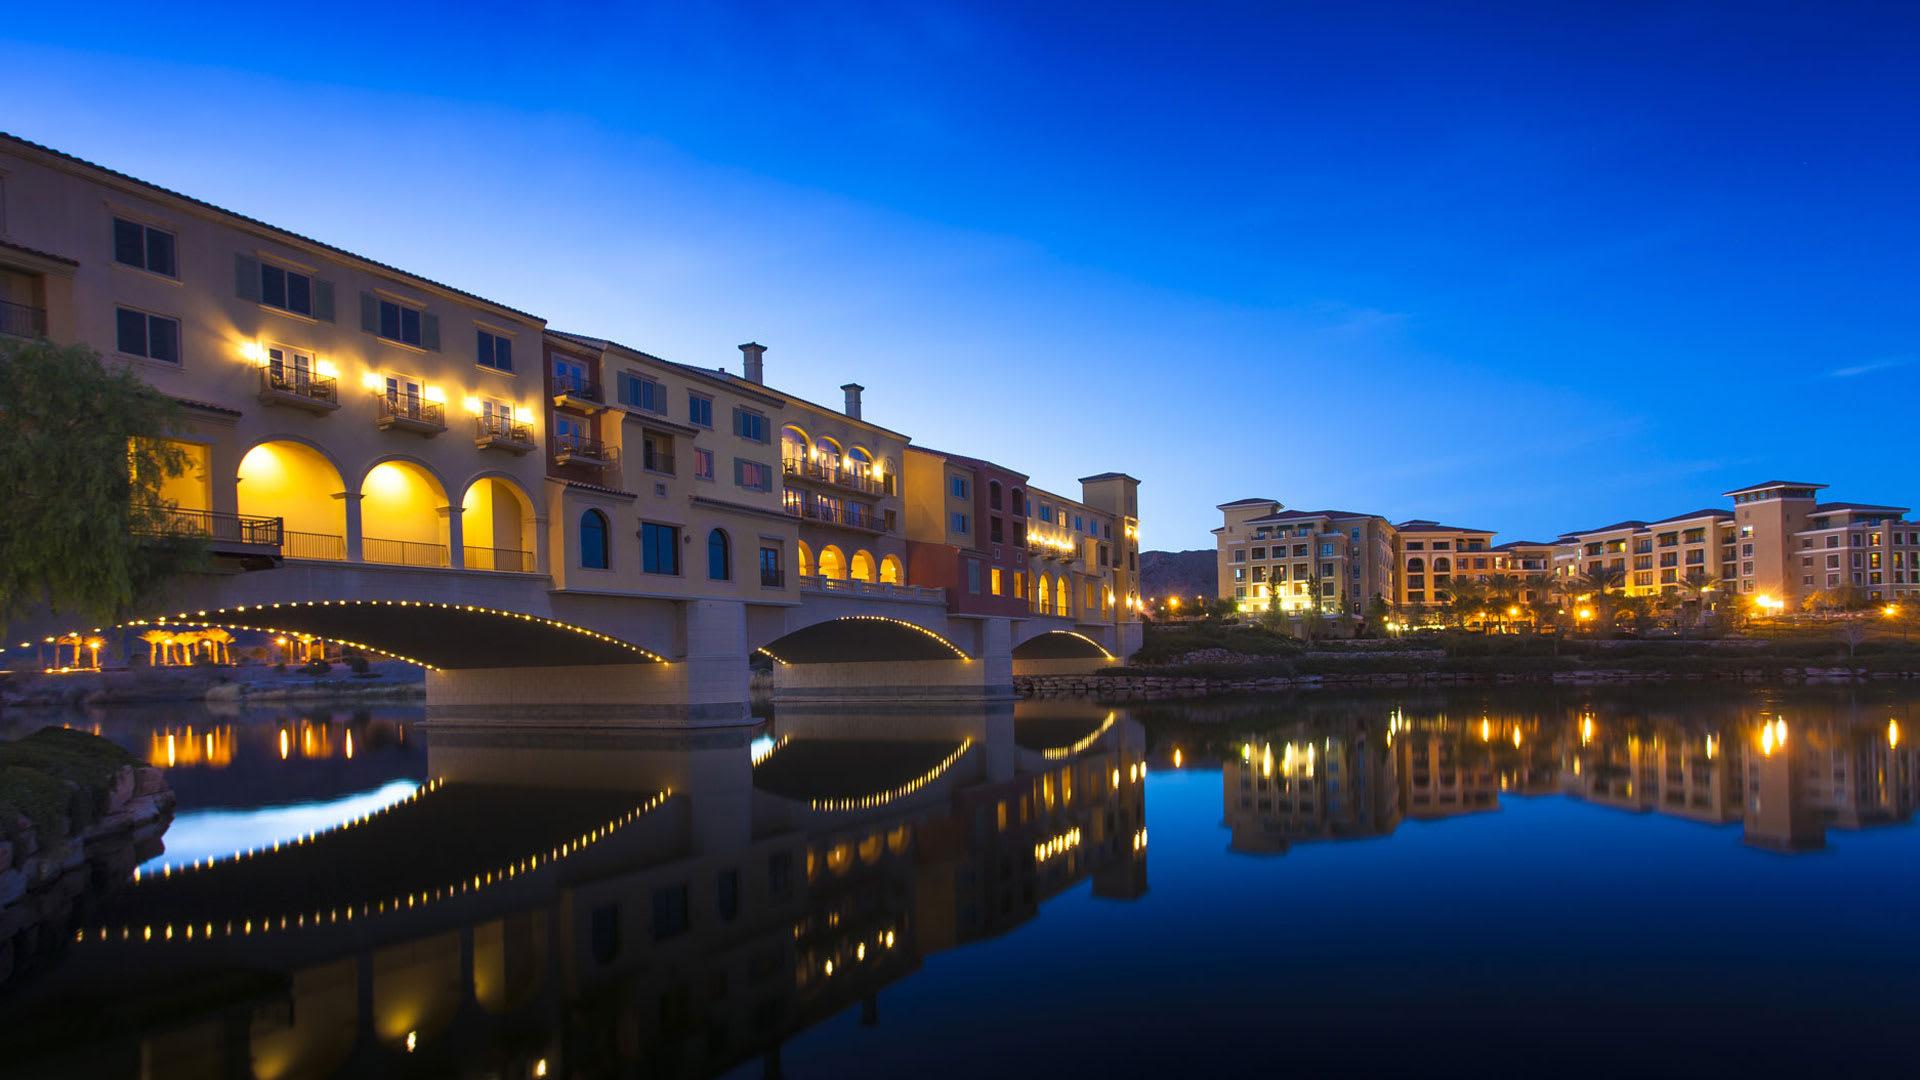 Enjoy views of the famed Ponte Vecchio bridge replica.